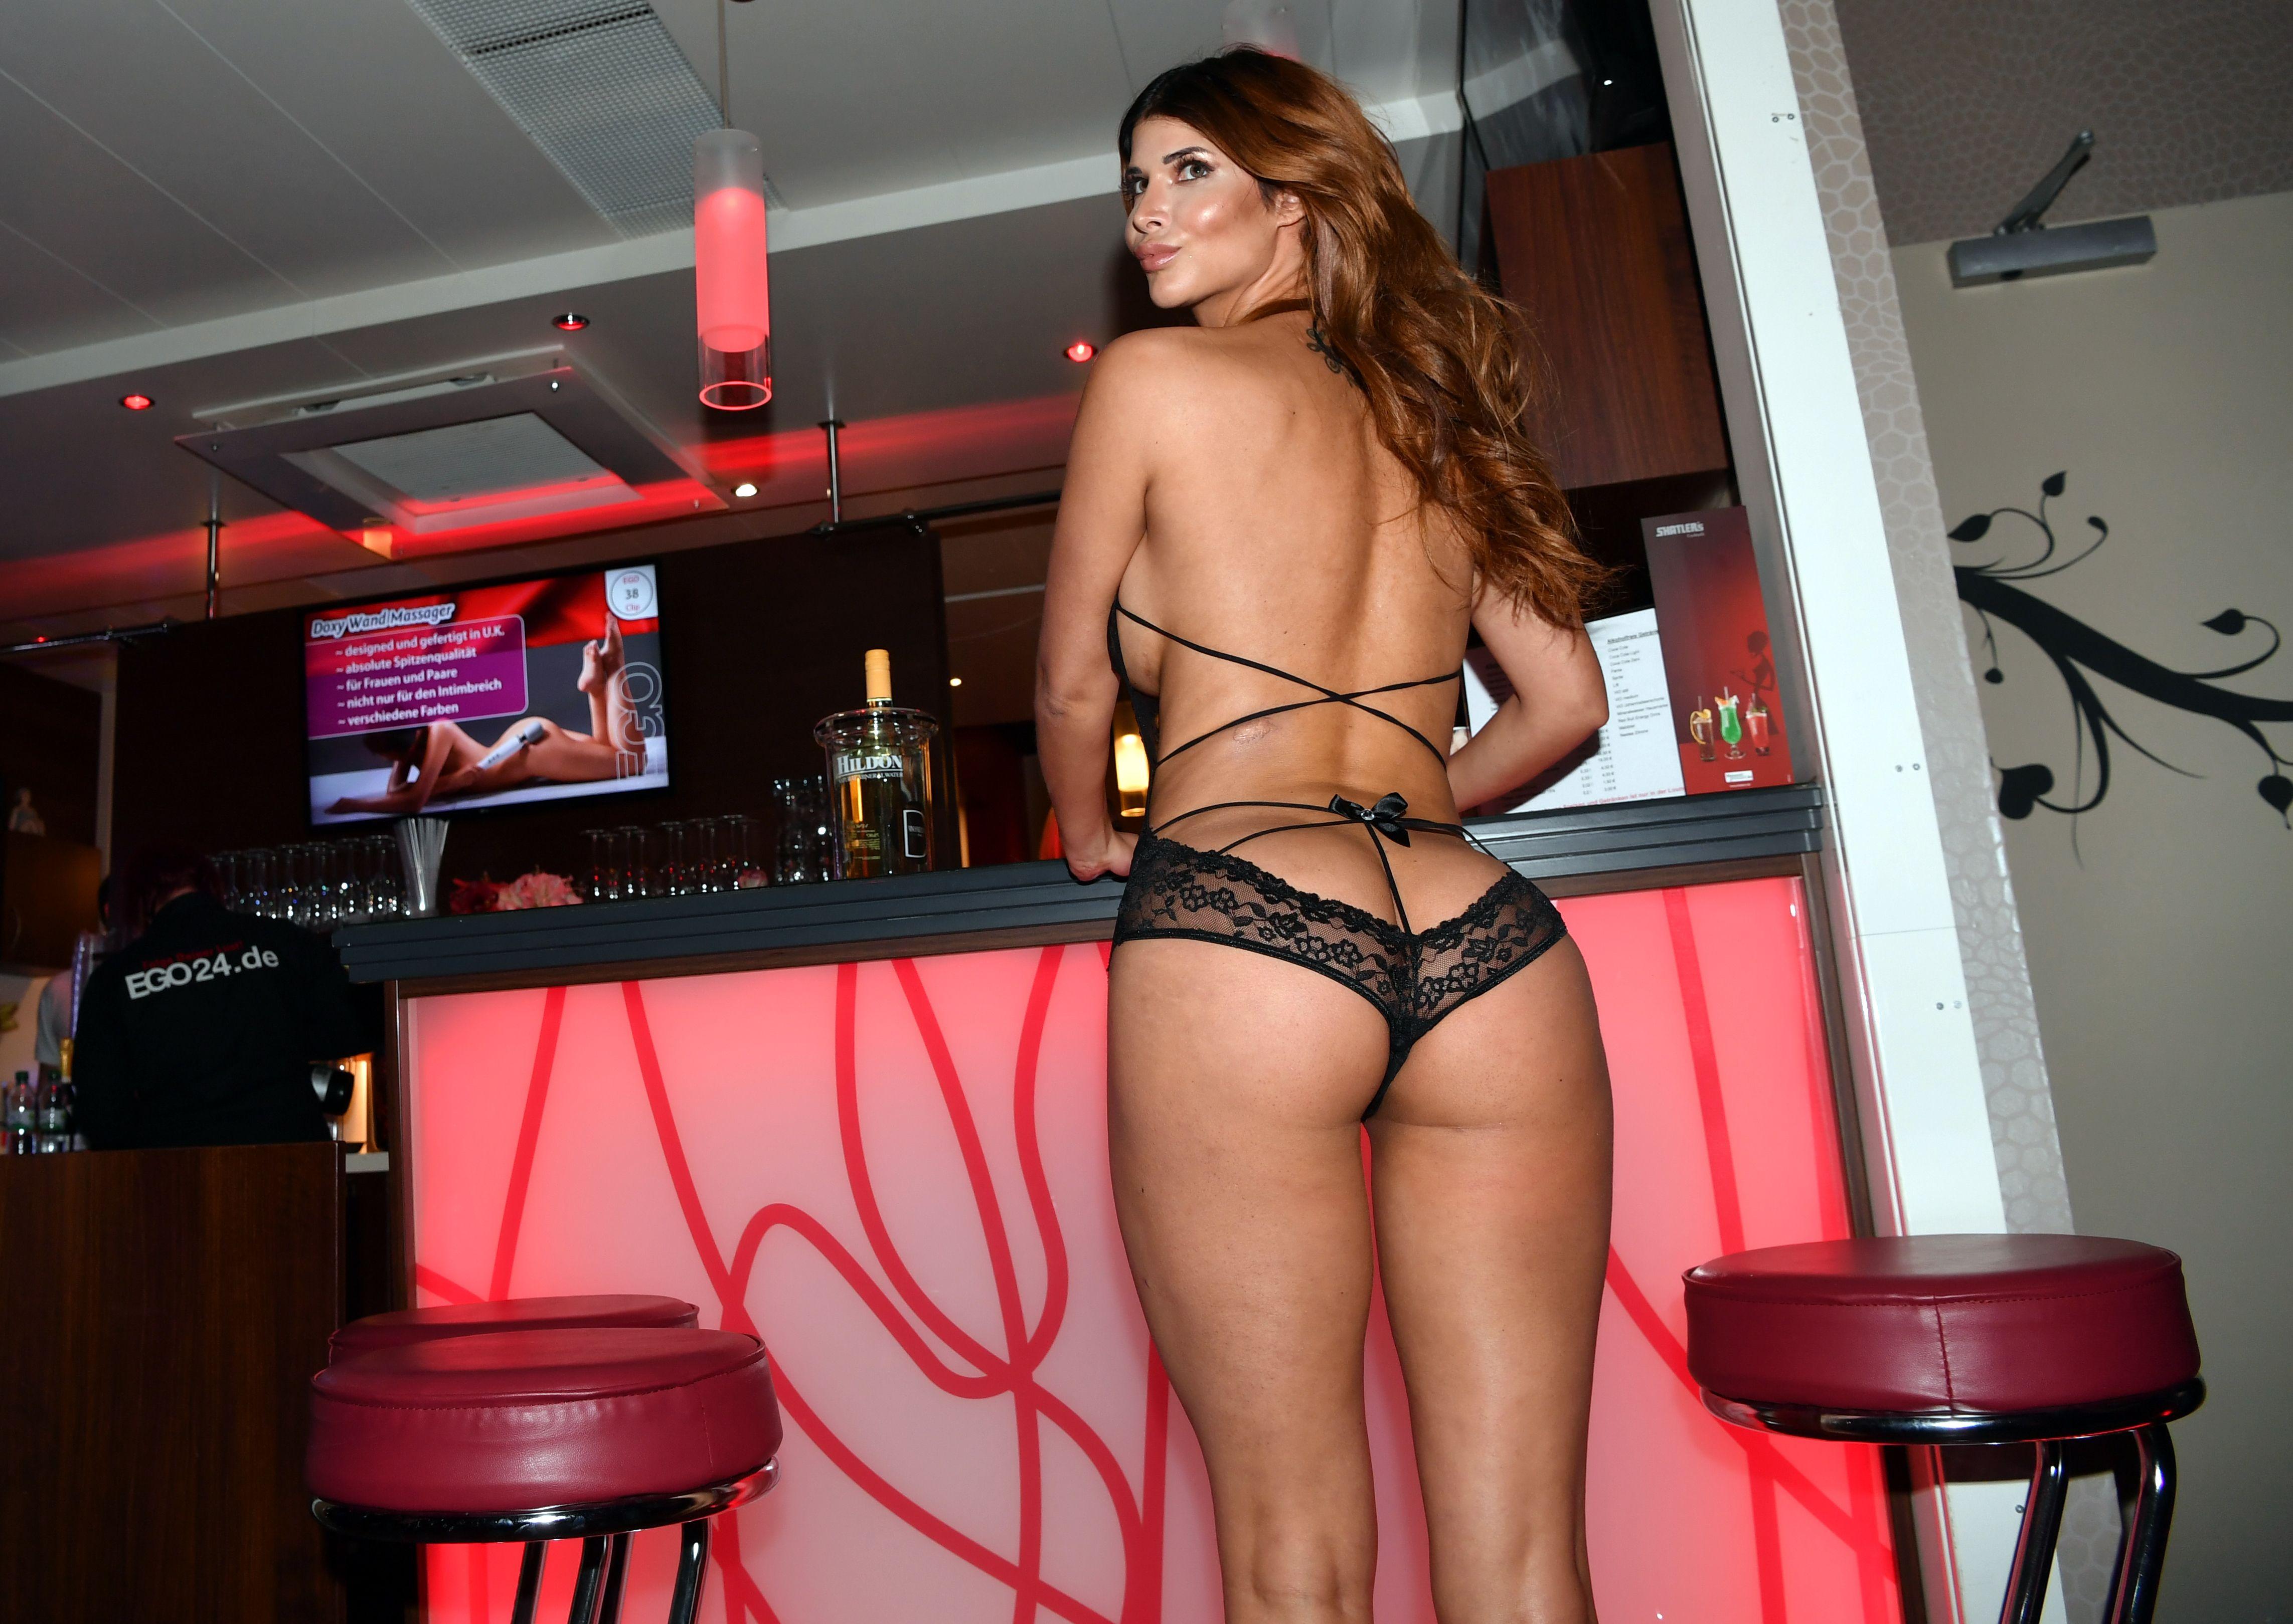 Watch Micaela schafer sexy 9 Photos video